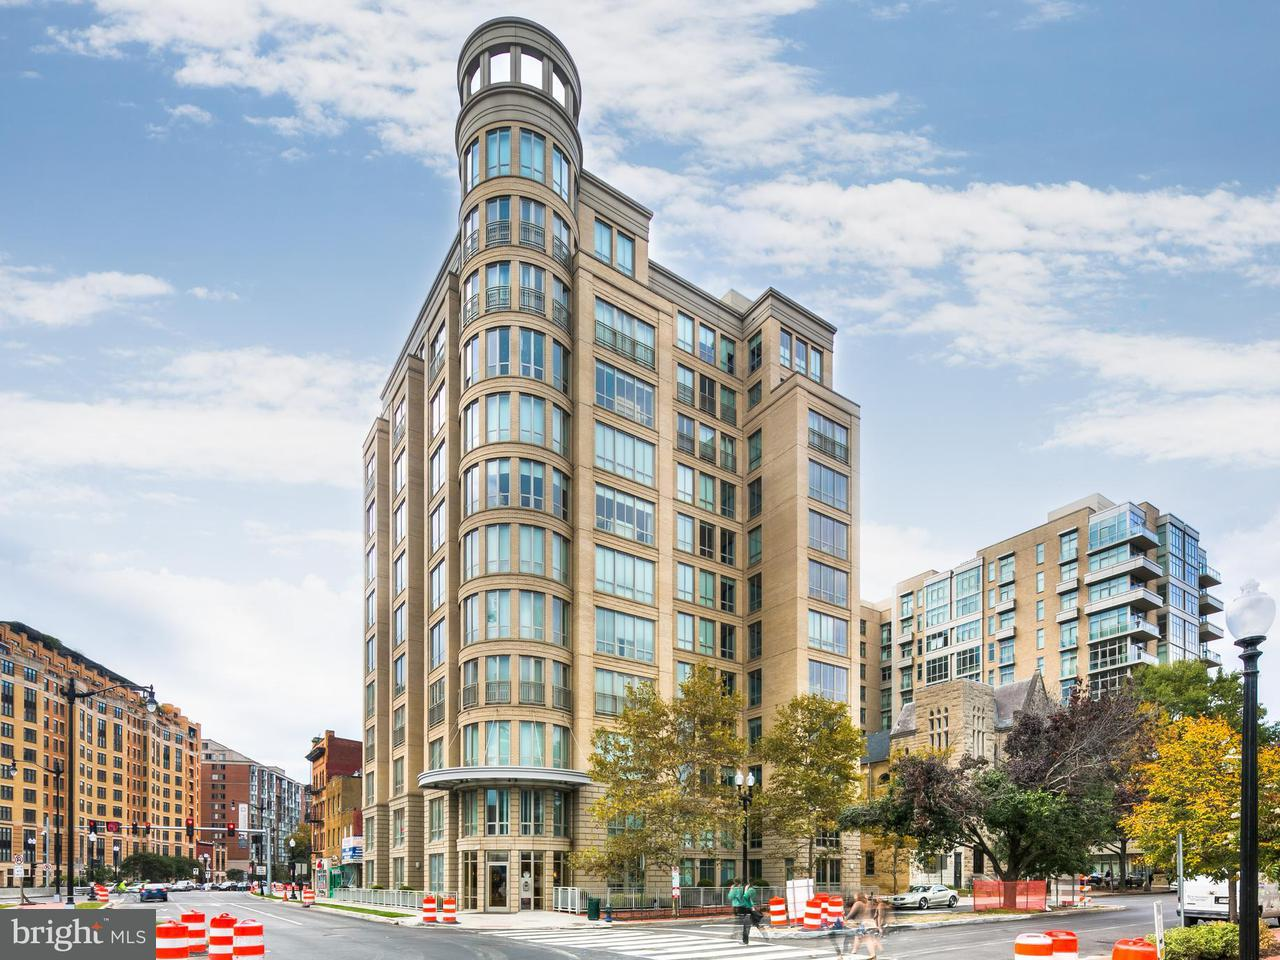 Condominium for Sale at 301 Massachusetts Ave Nw #503 301 Massachusetts Ave Nw #503 Washington, District Of Columbia 20001 United States